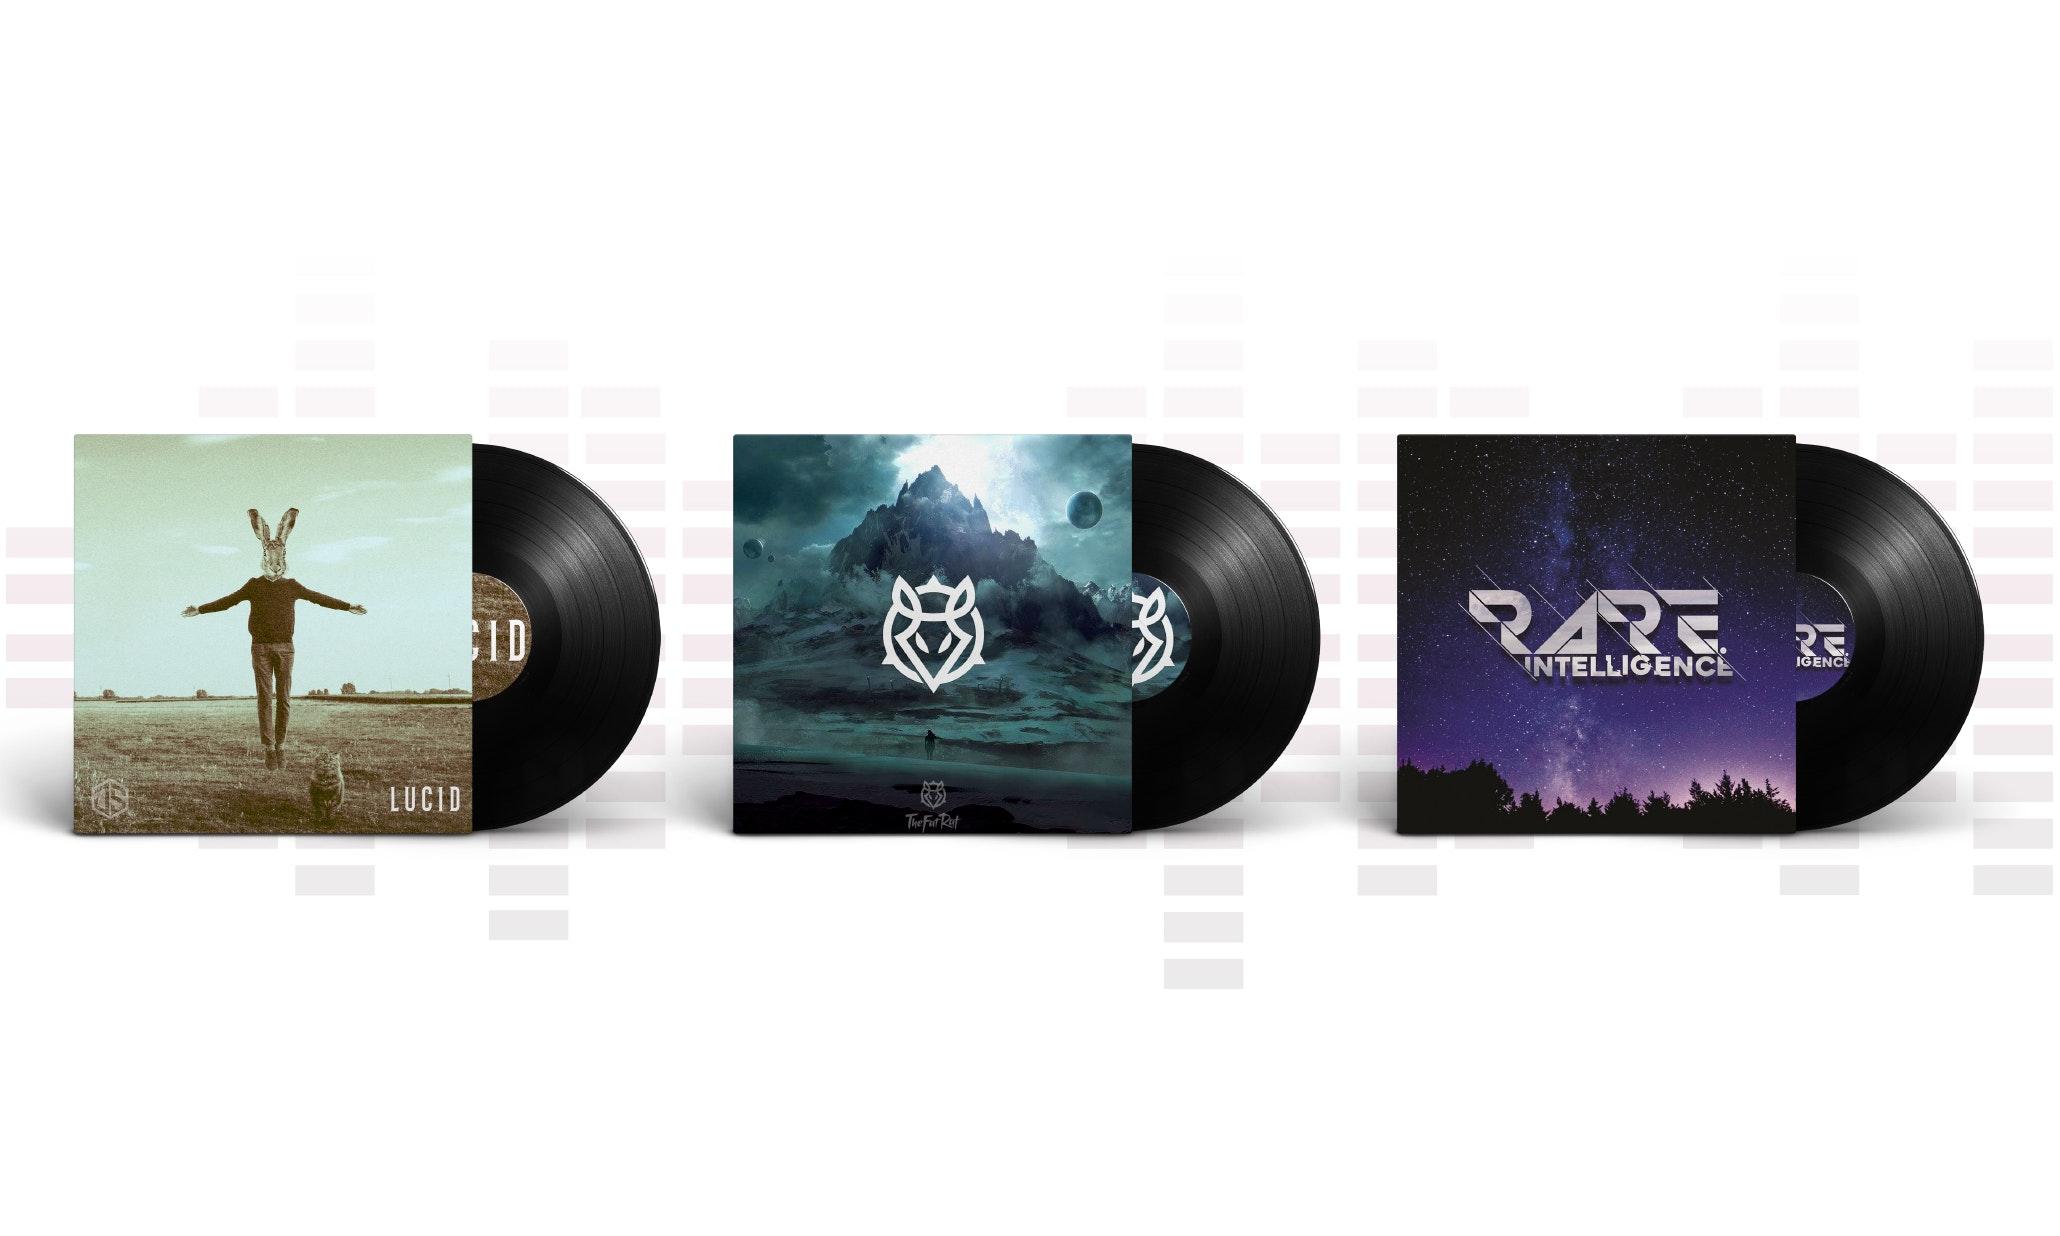 15 DJ logos that raise the roof